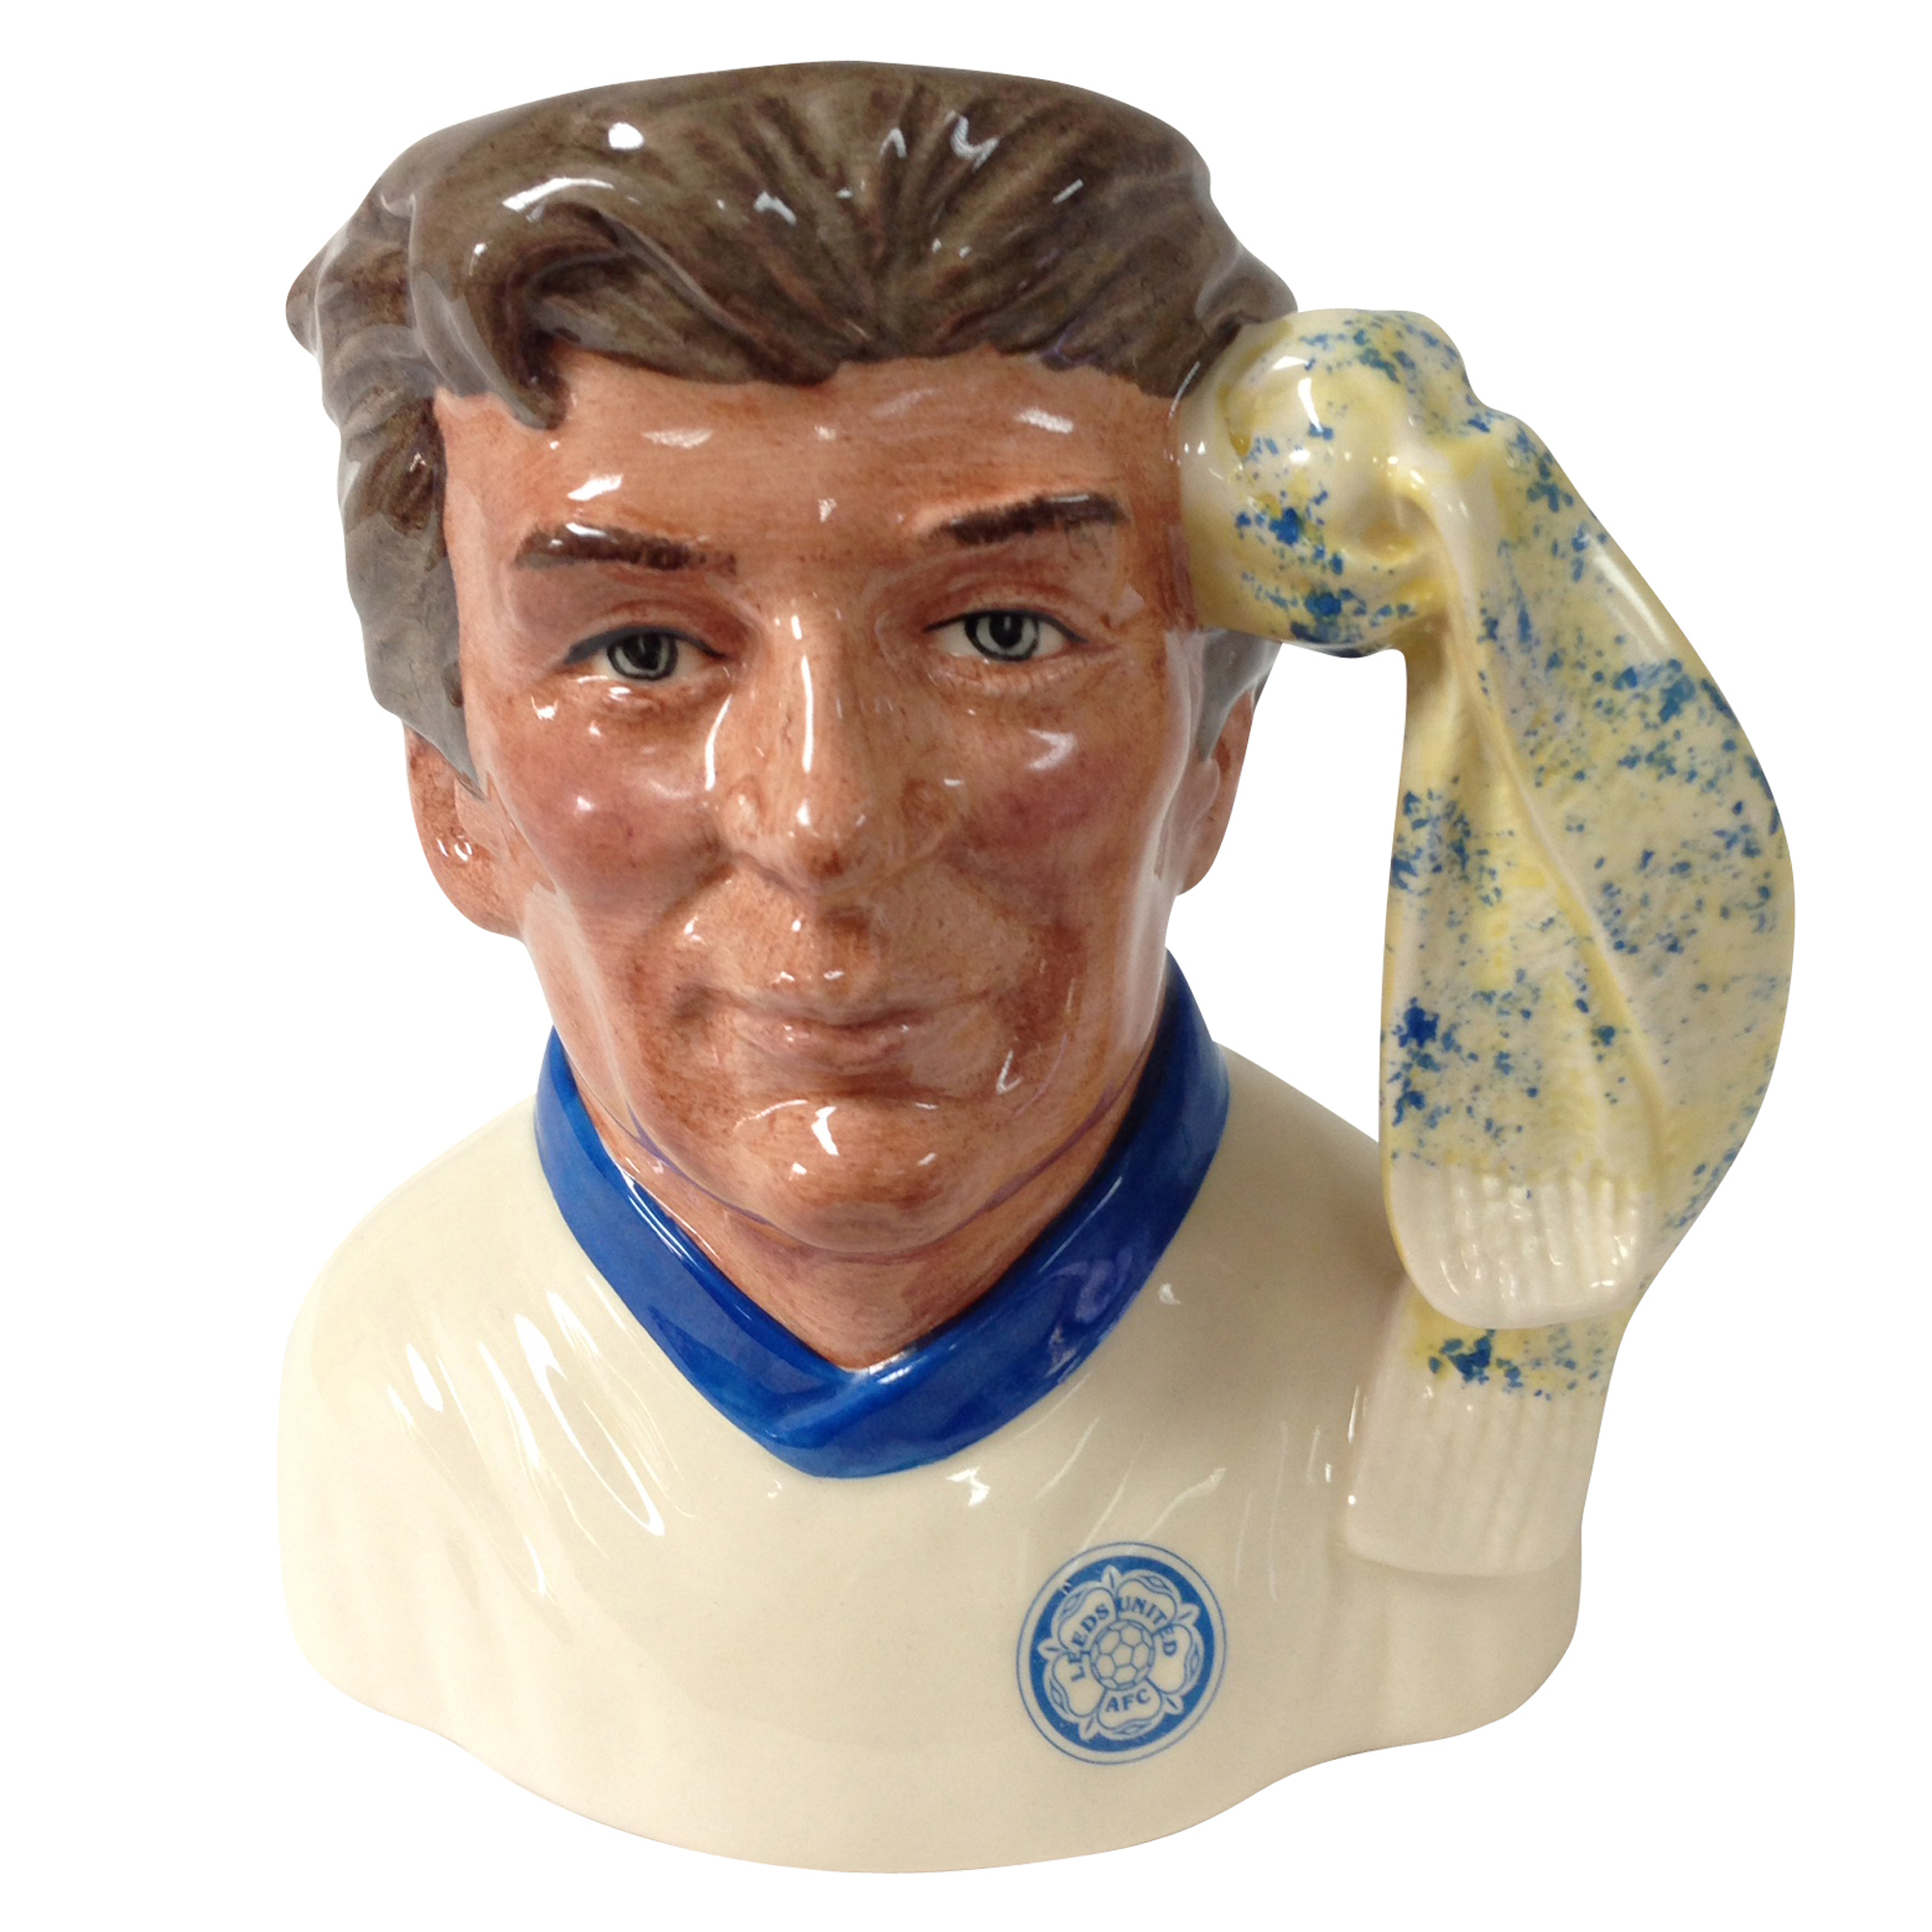 Leeds United Football Club Supporter D6928 - Small - Royal Doulton Character Jug